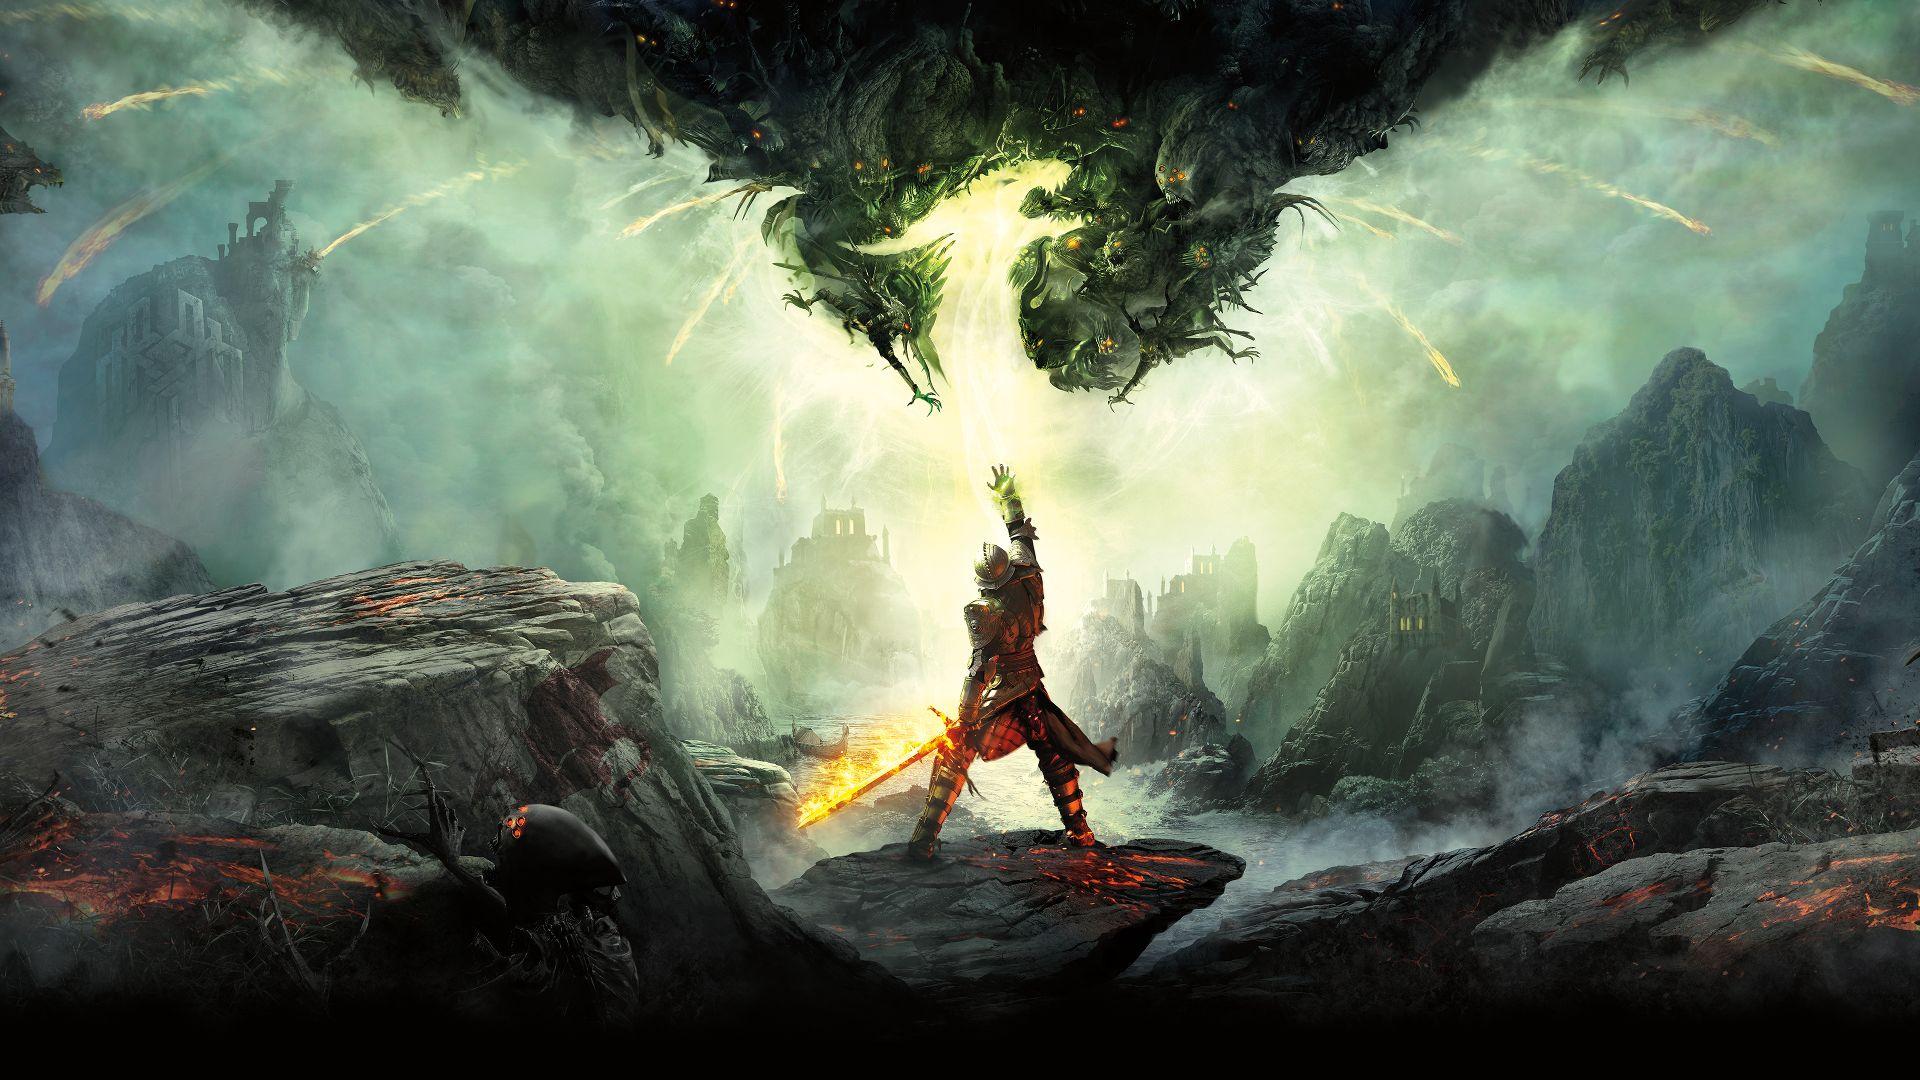 Dragon Age 4 Lead Producer Leaves BioWare